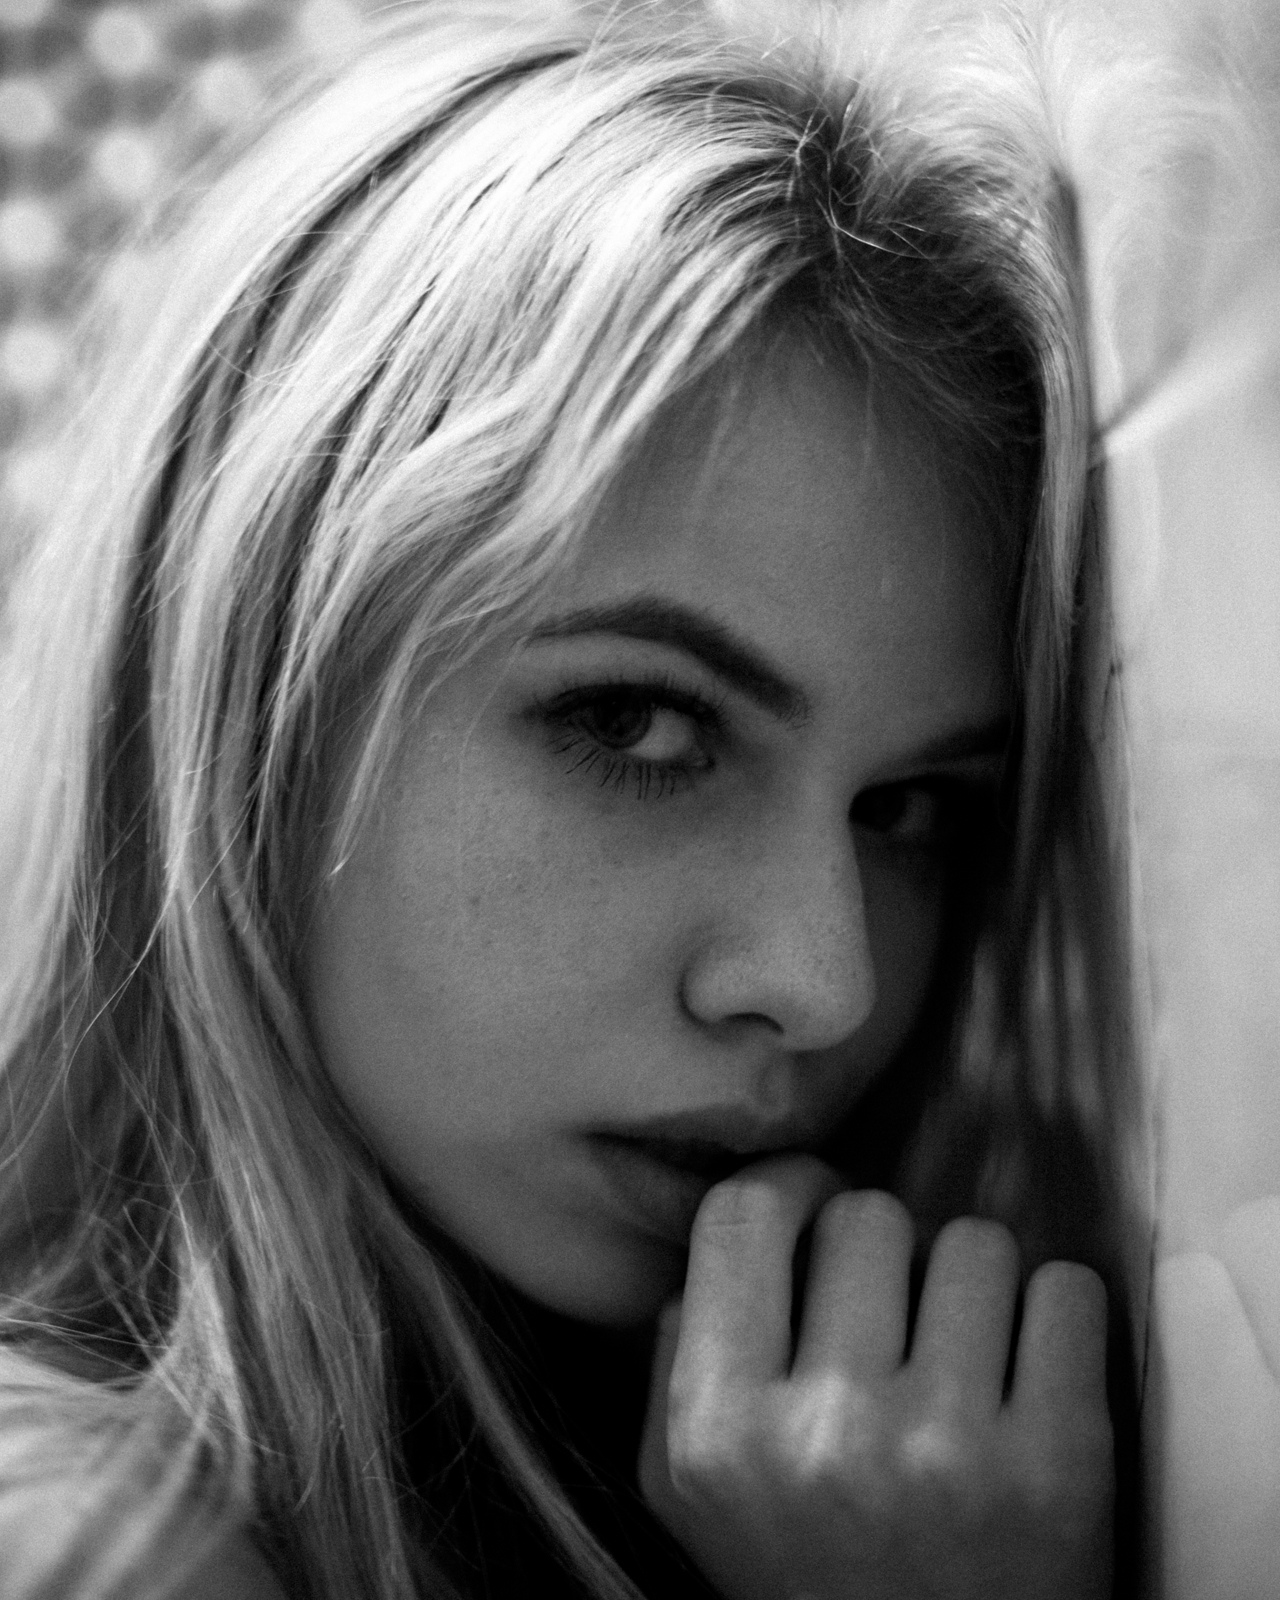 Alexandra Smelova by Semen Ereshko / Александра Смелова - фотограф Семен Ерешко